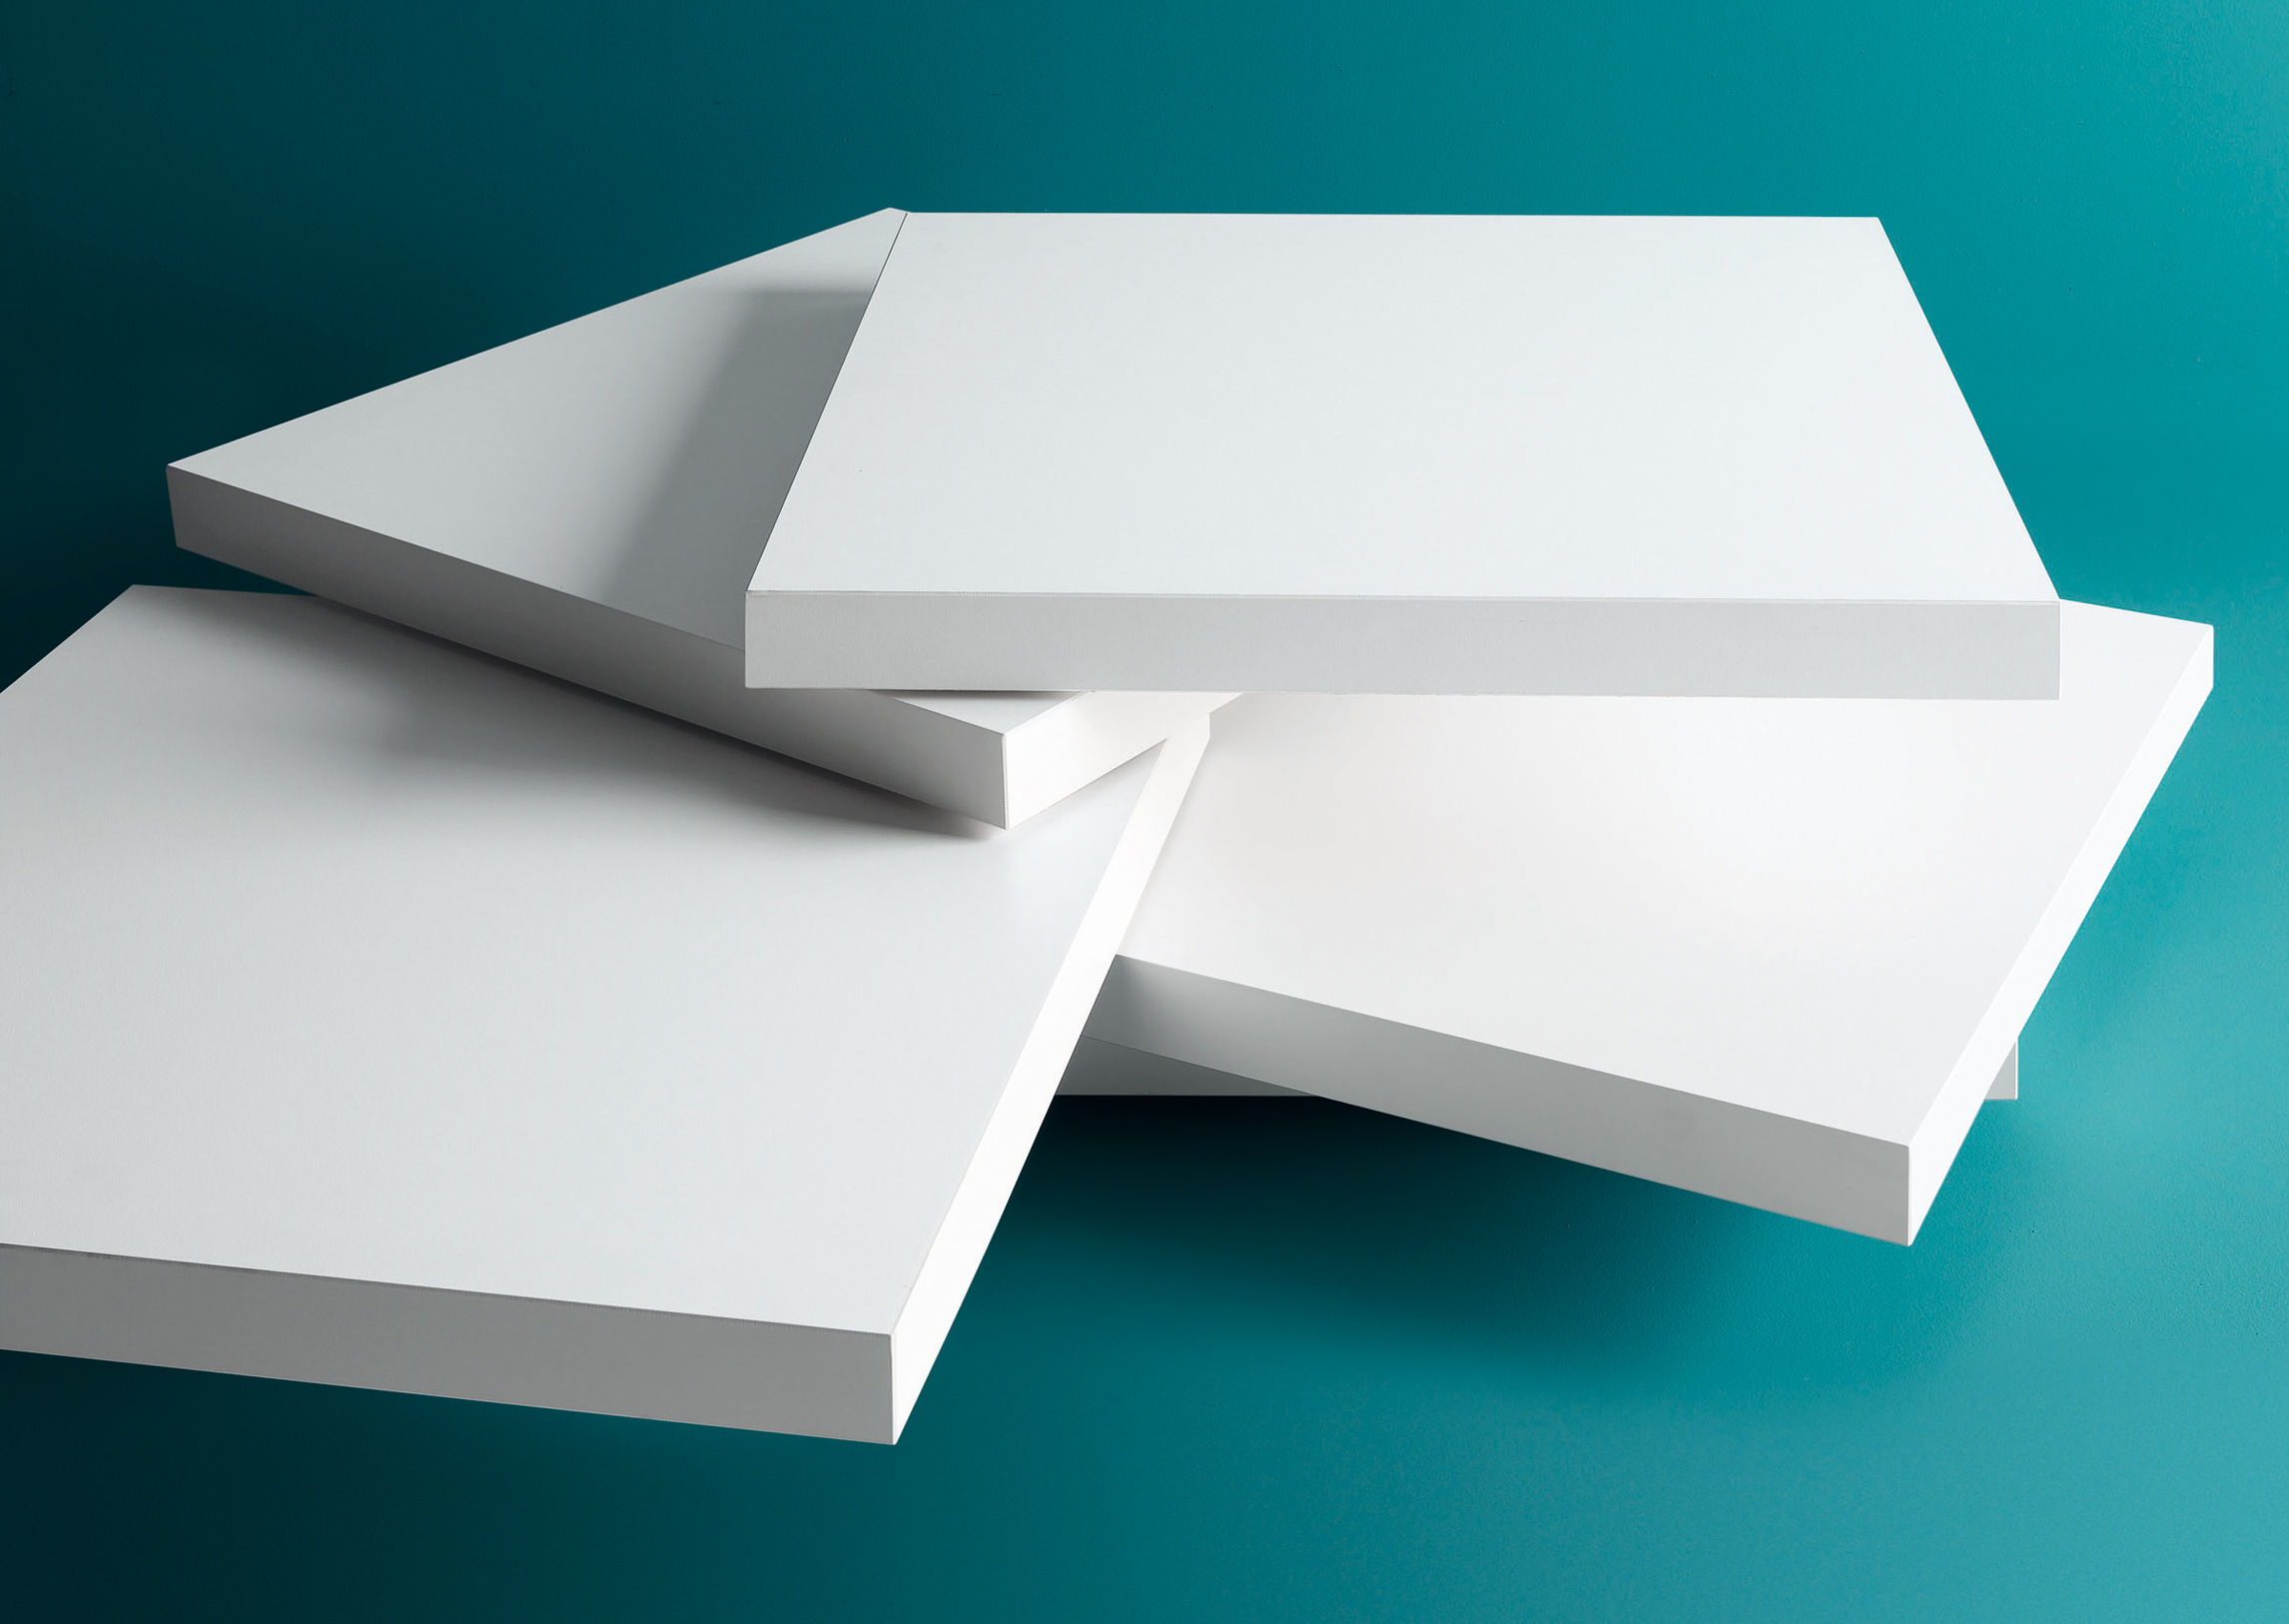 Table basse rotor / plateaux pivotants blanc   kristalia